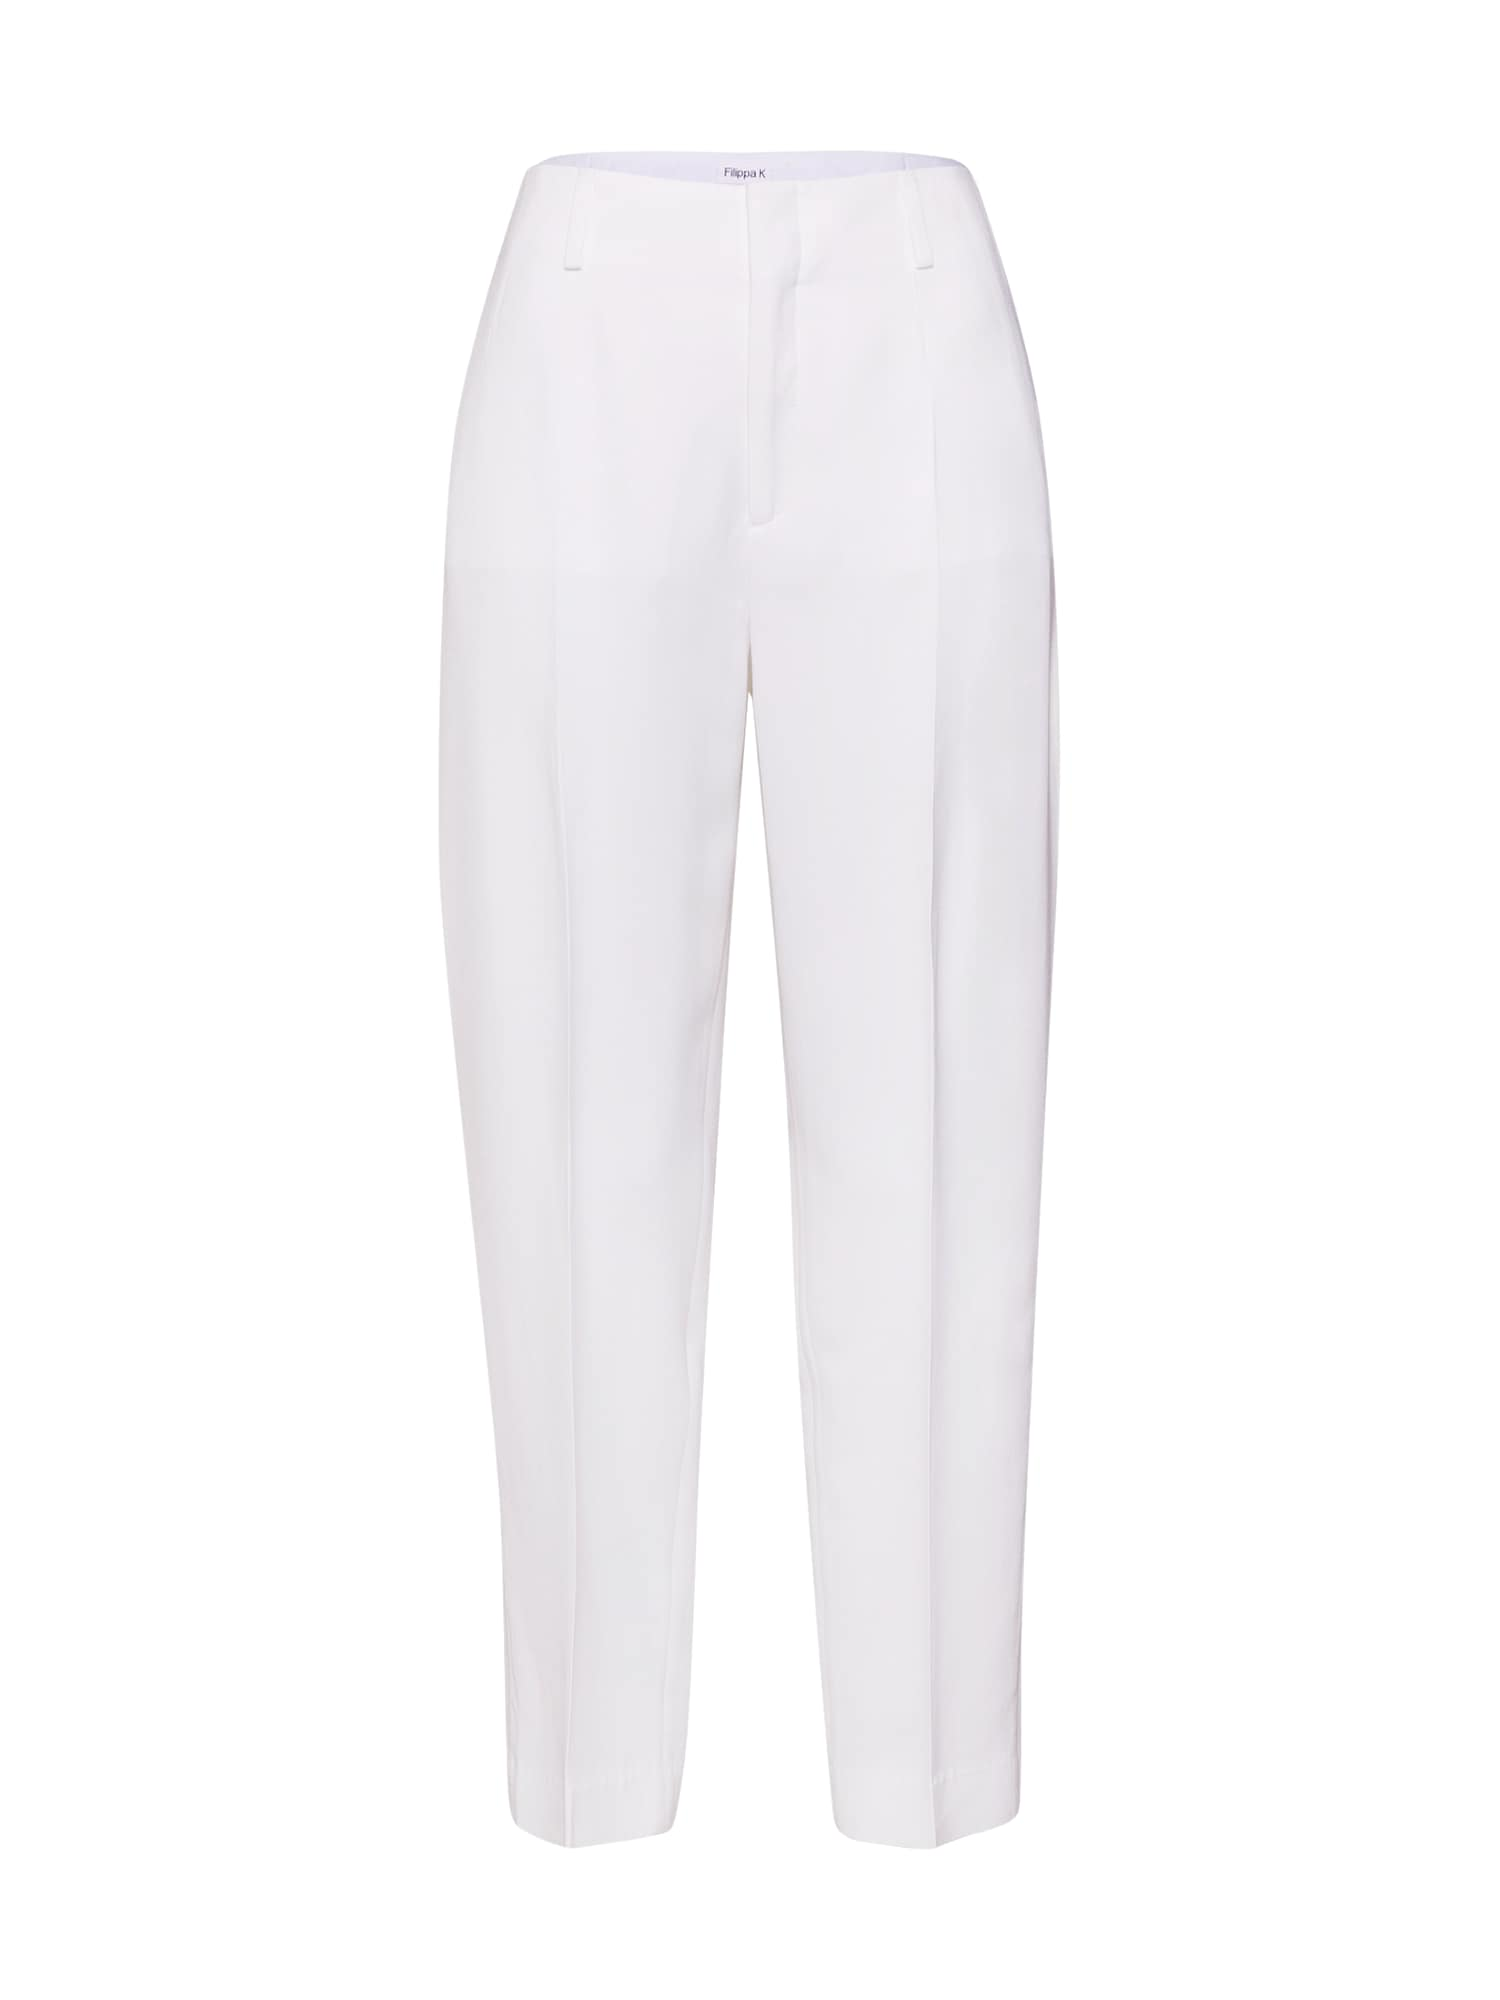 Kalhoty se sklady v pase Karlie bílá Filippa K